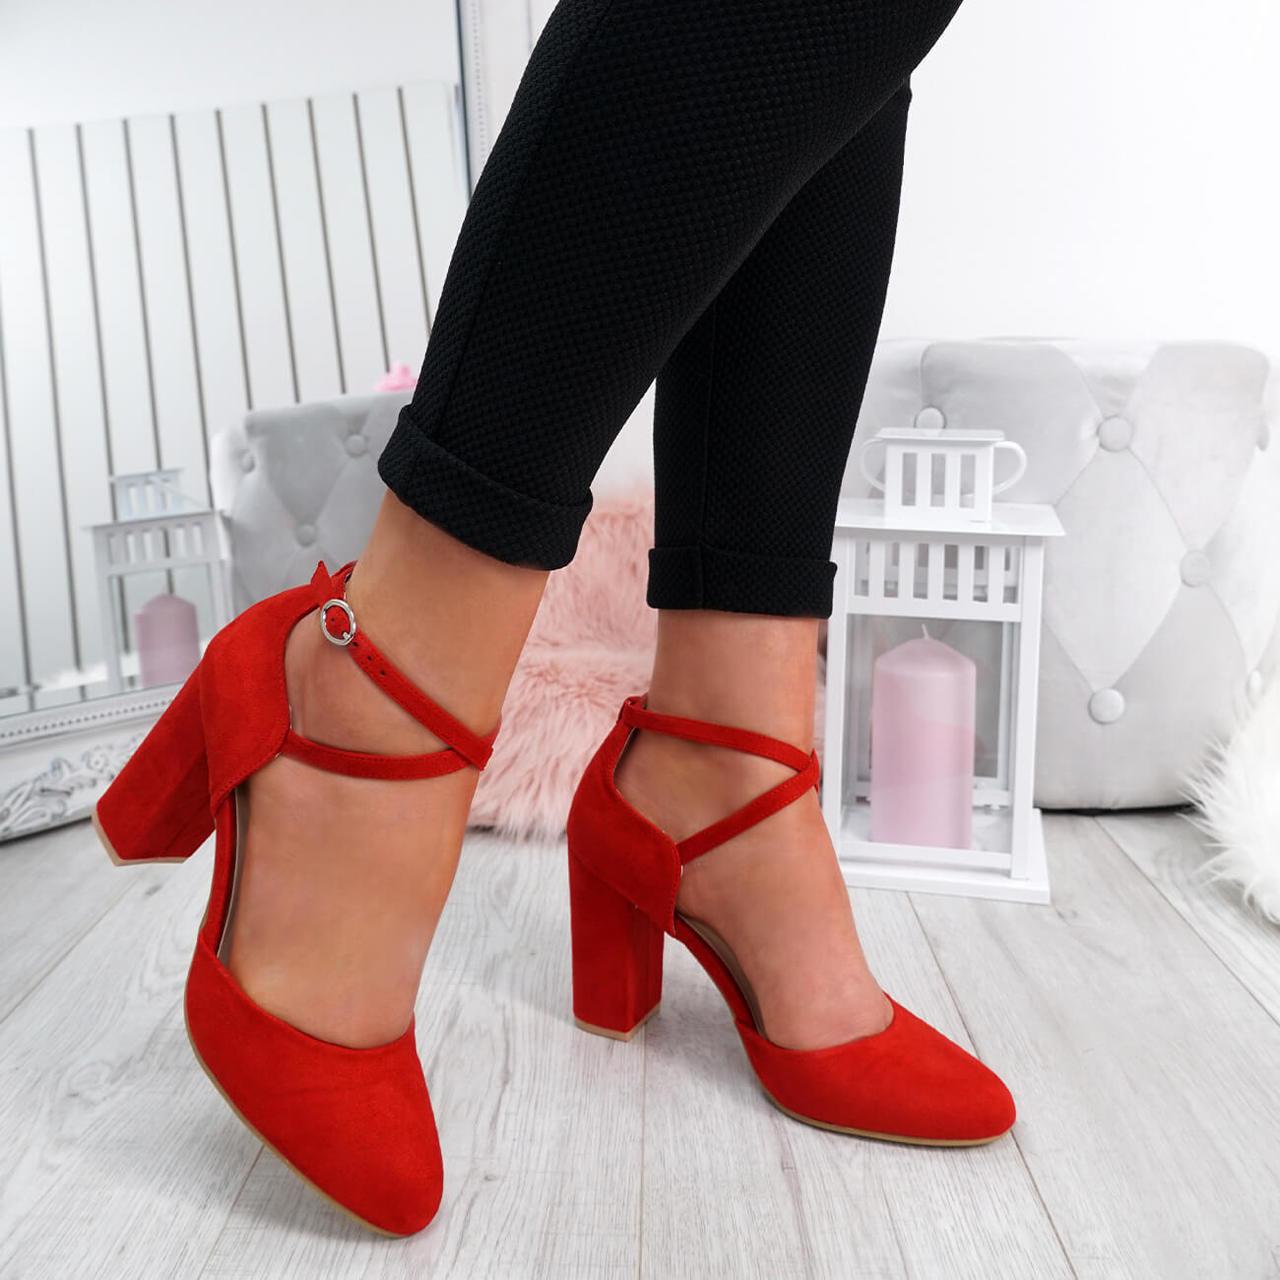 Block Heel Pumps Buckle Strap Casual Shoes